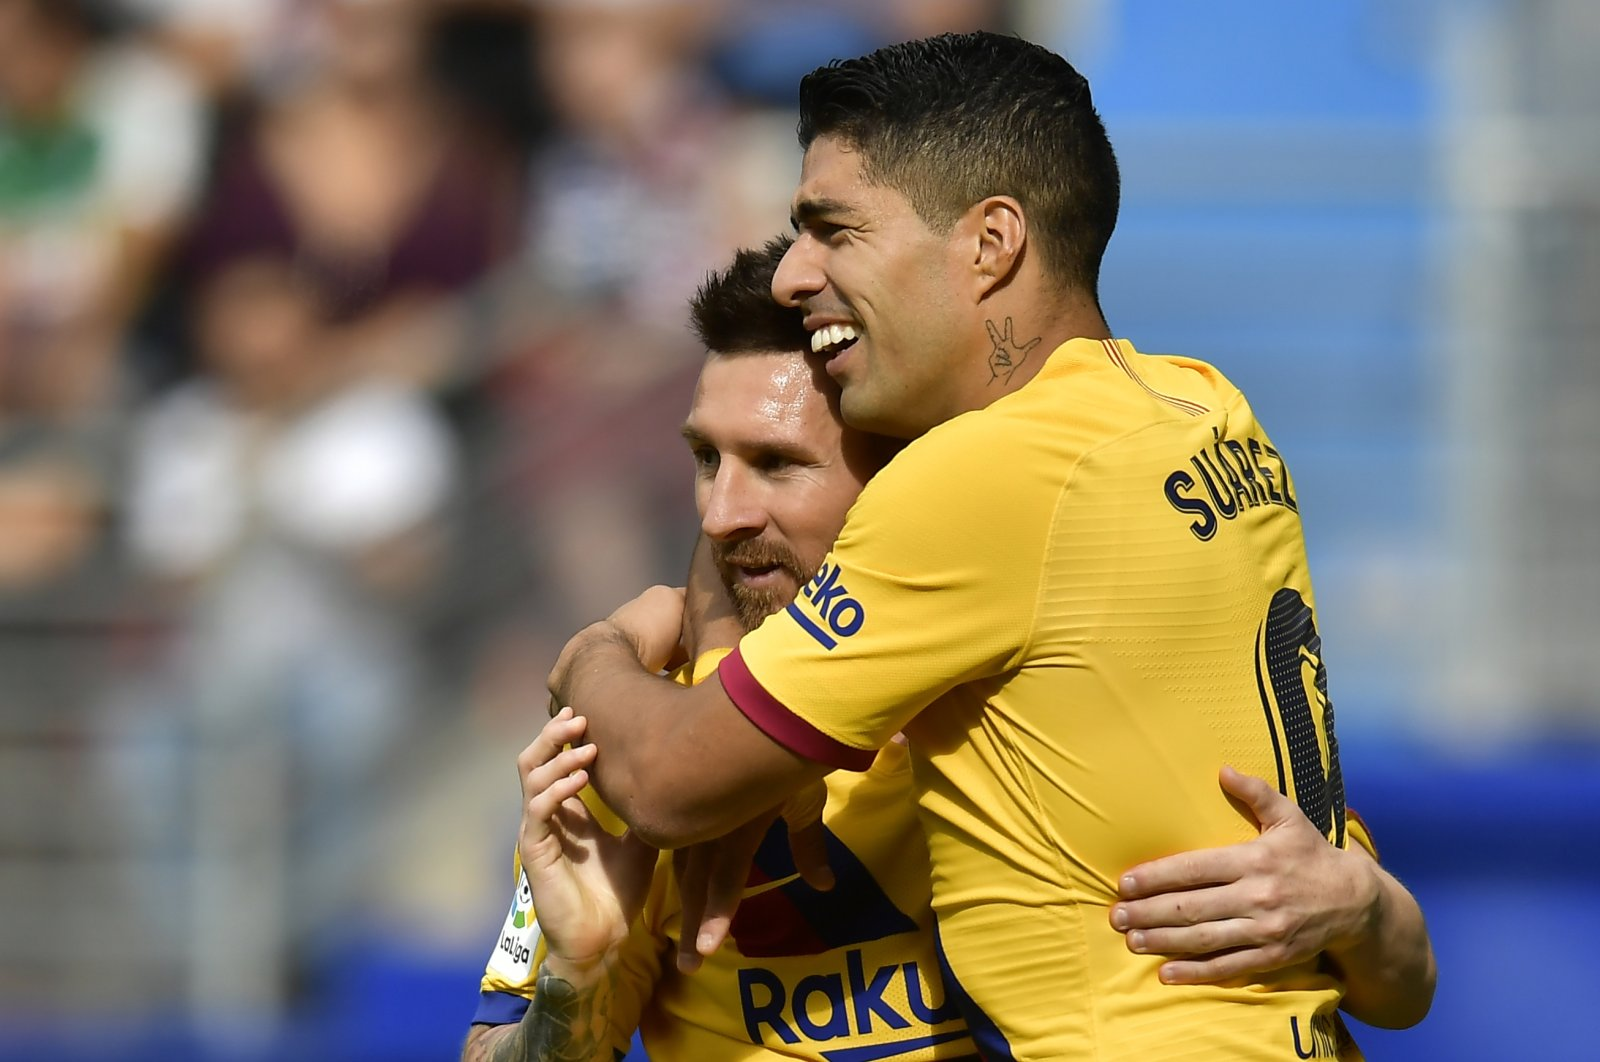 Barcelona's Luis Suarez (R) celebrates a goal with Lionel Messi during a La Liga match against Eibar, in Eibar, Spain, Oct. 19, 2019. (AP Photo)